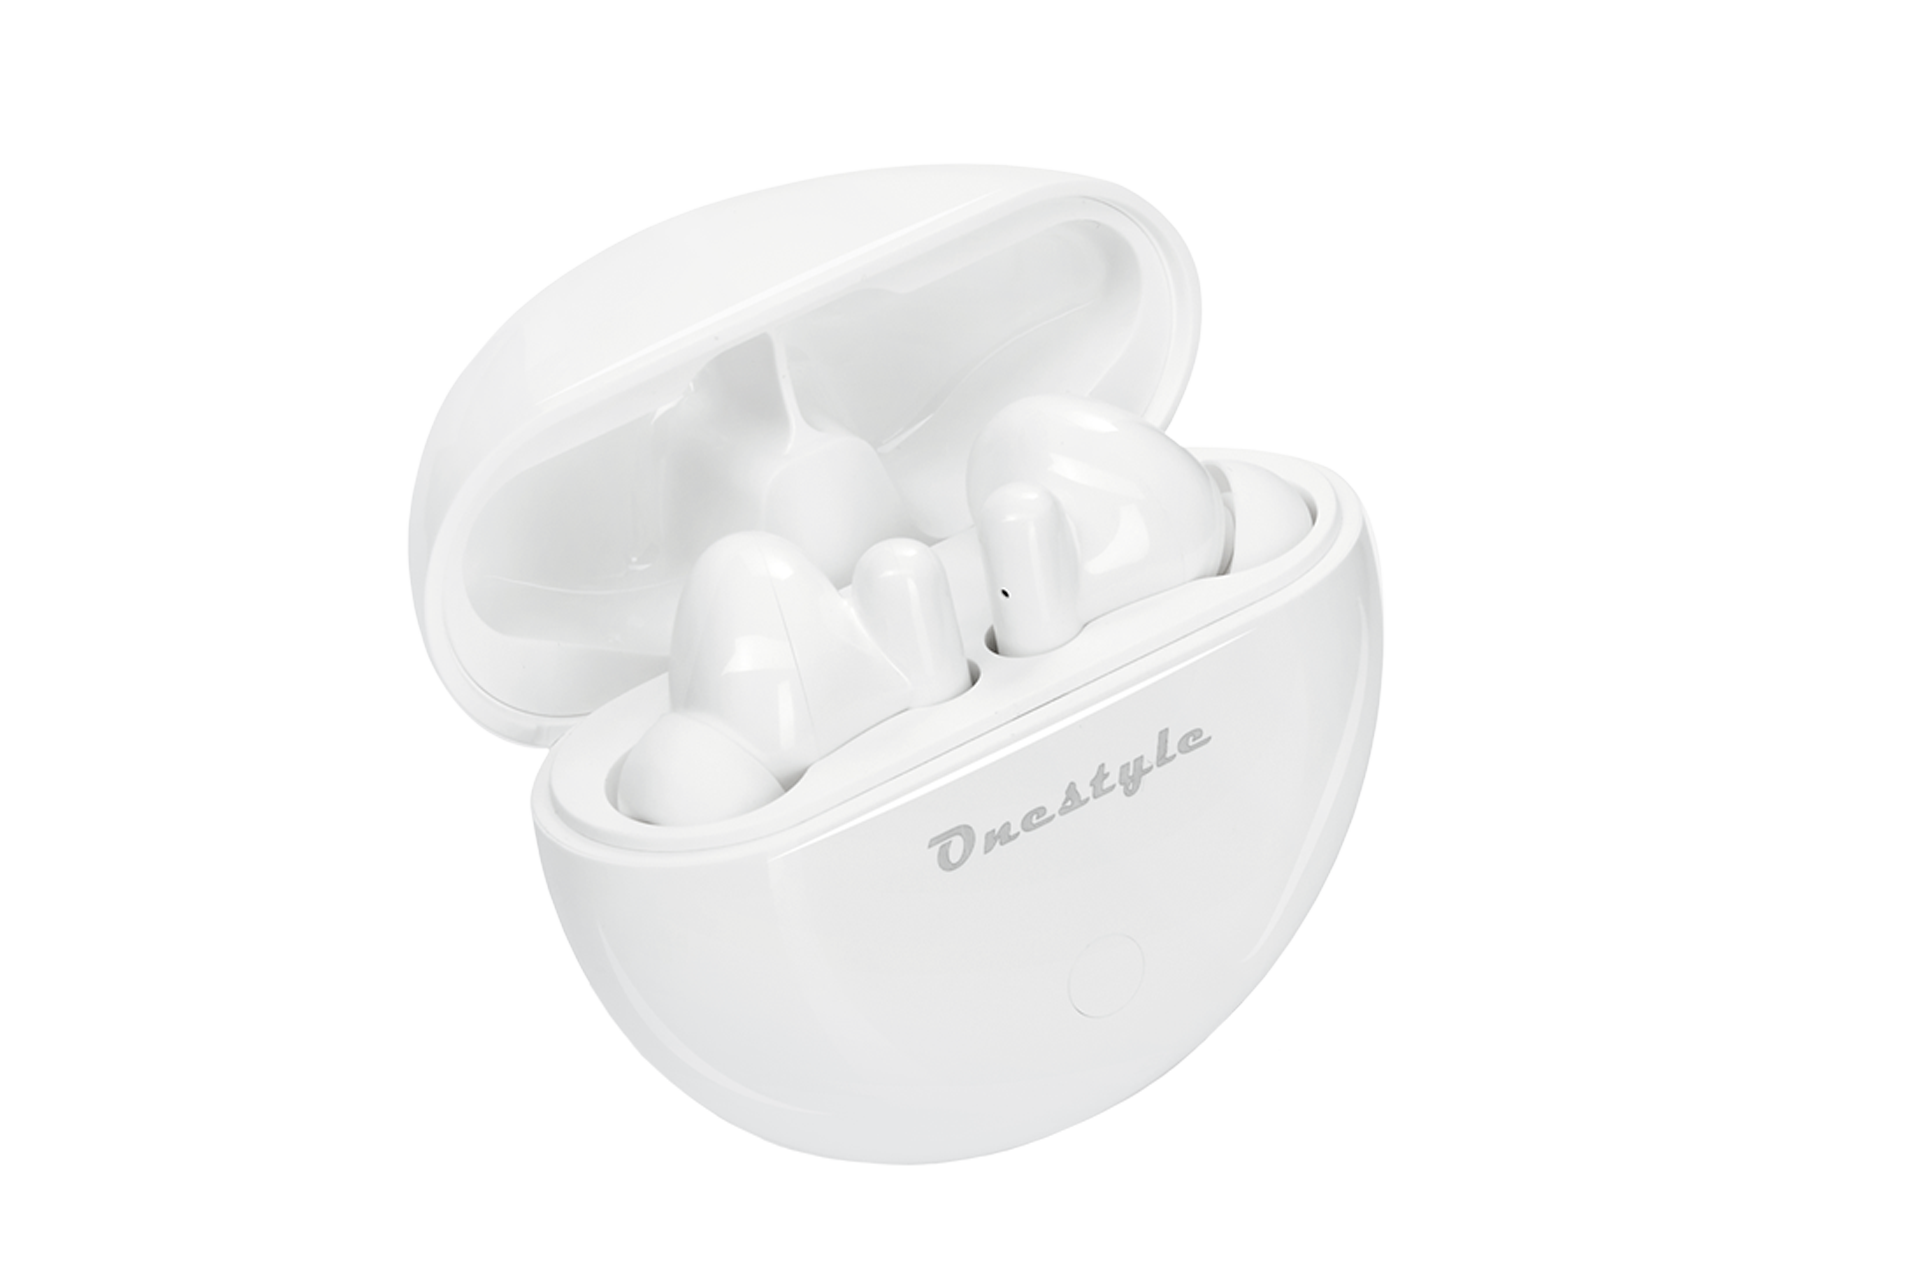 Onestyle TWS-BT-V13 Bluetooth Kopfhörer, In-Ear, True-Wireless